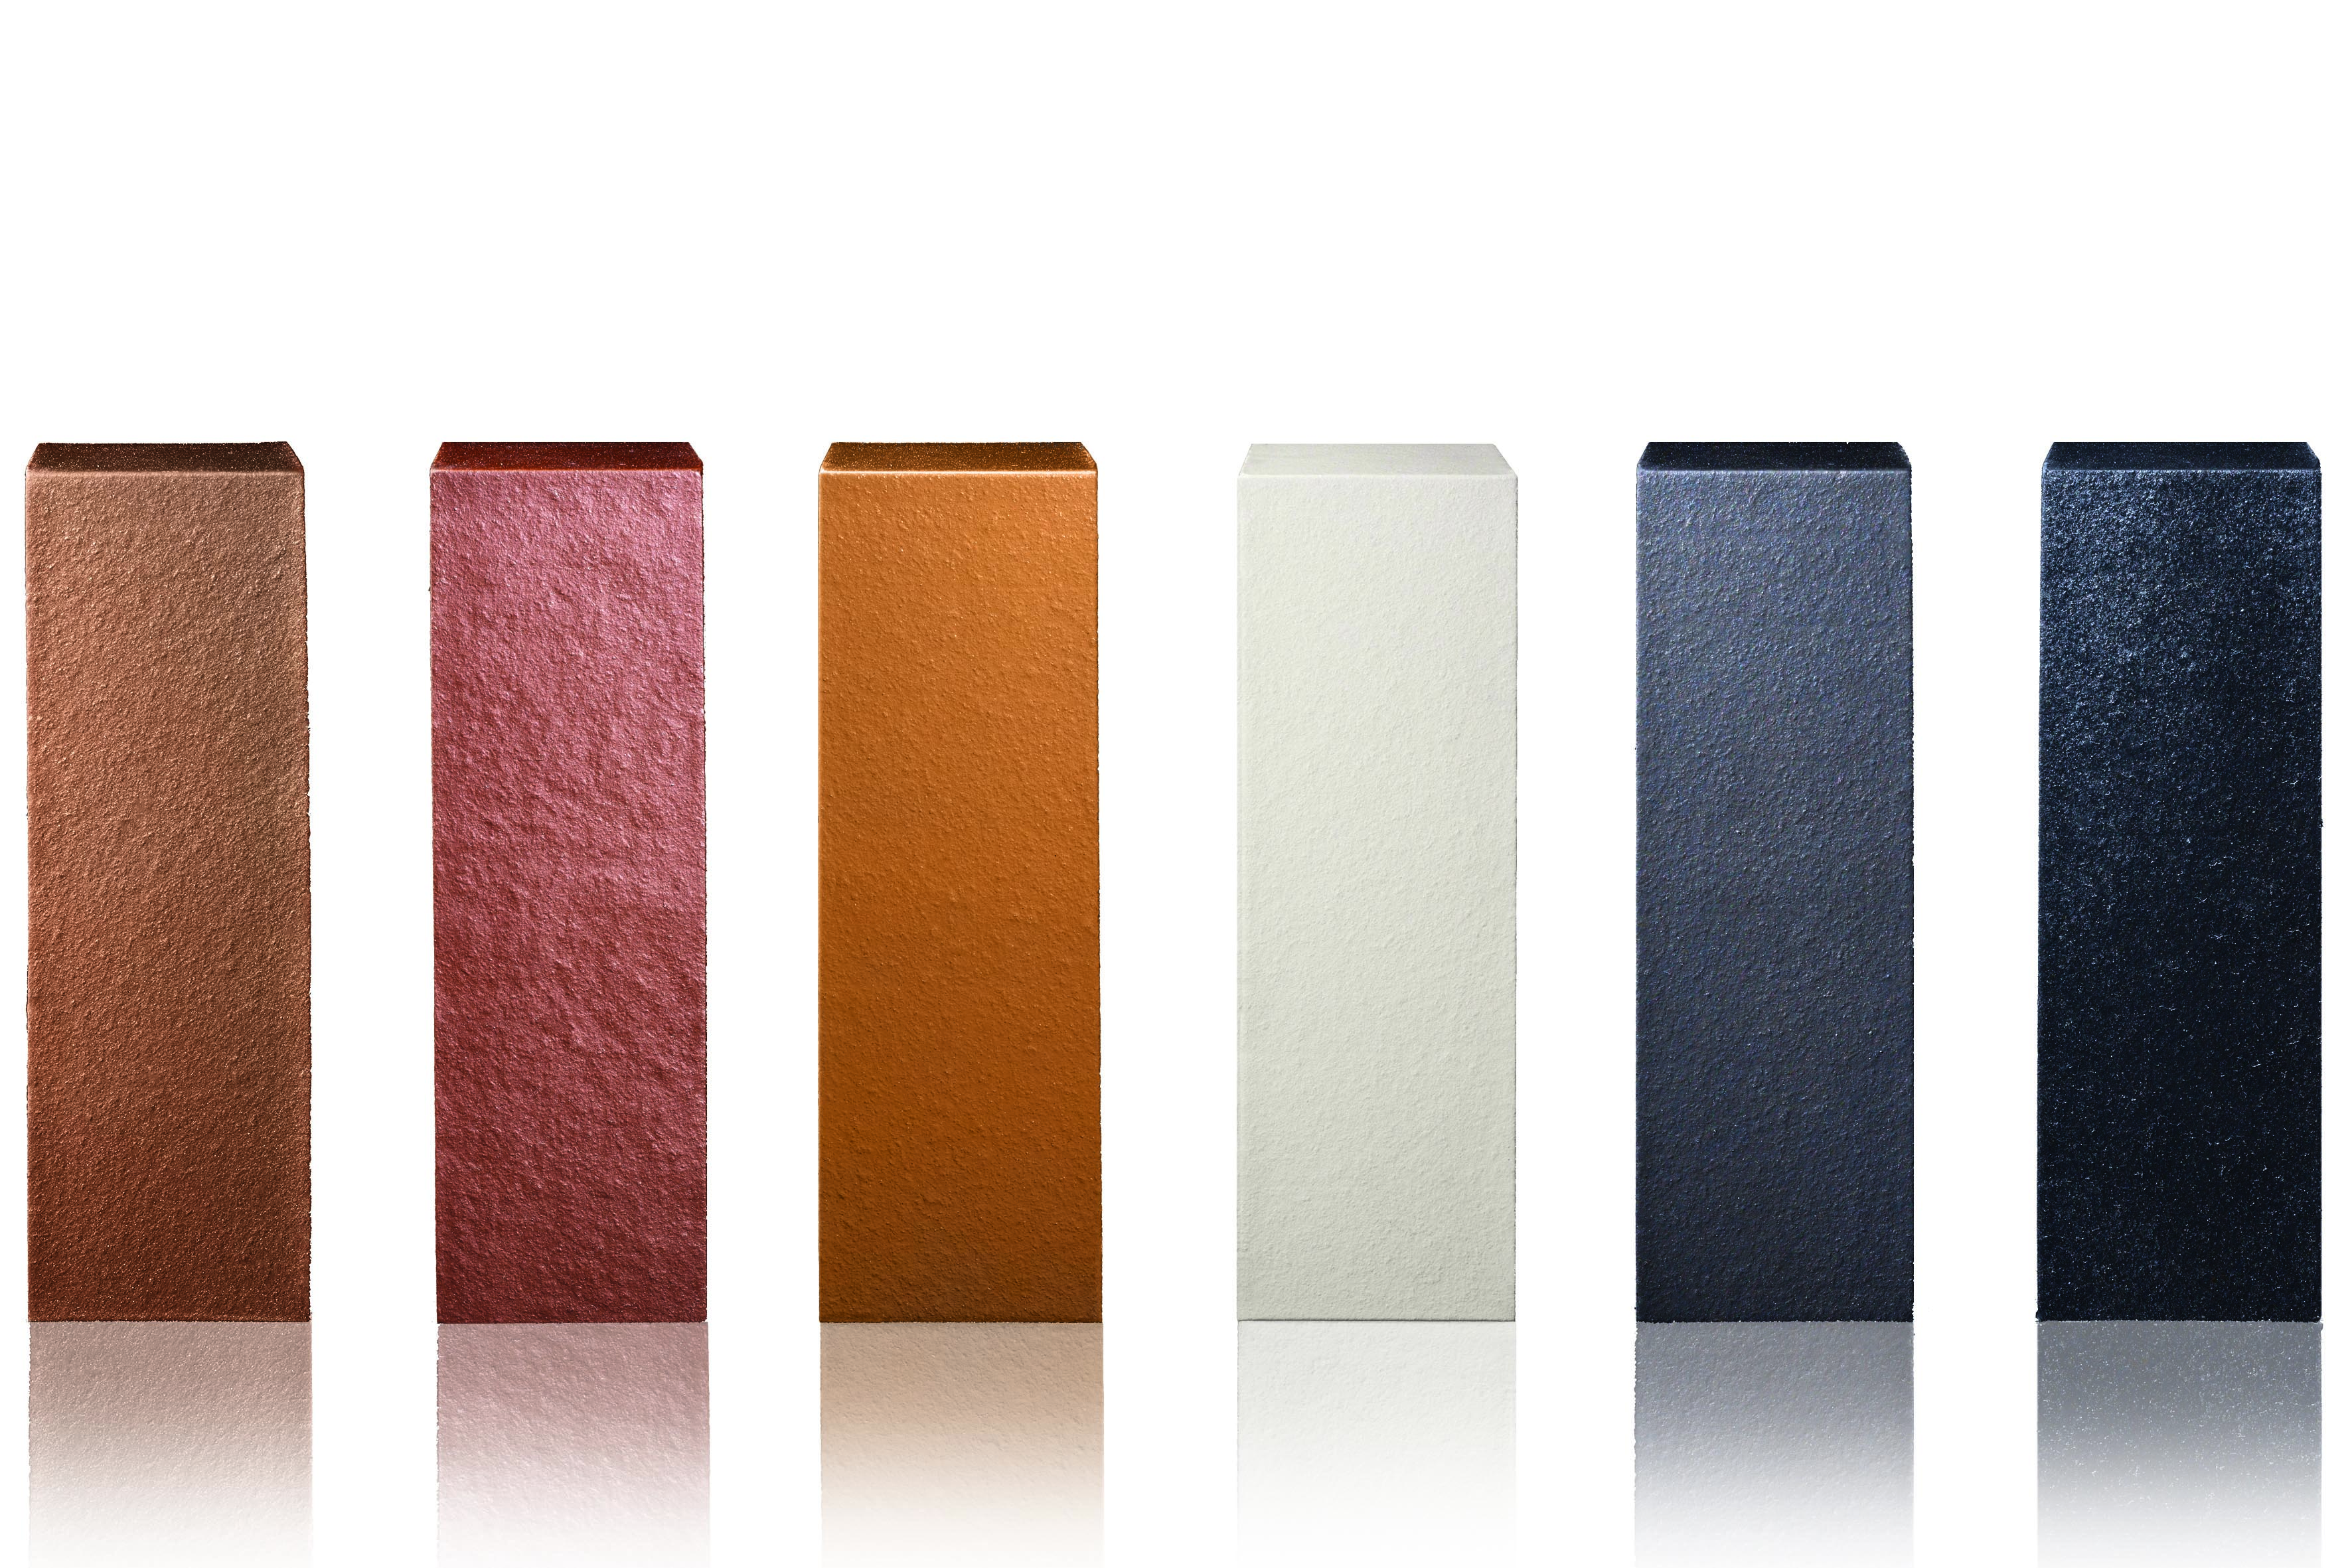 Lighting Basement Washroom Stairs: New 'Allure' Range Of Sumptuous Metallic Bricks